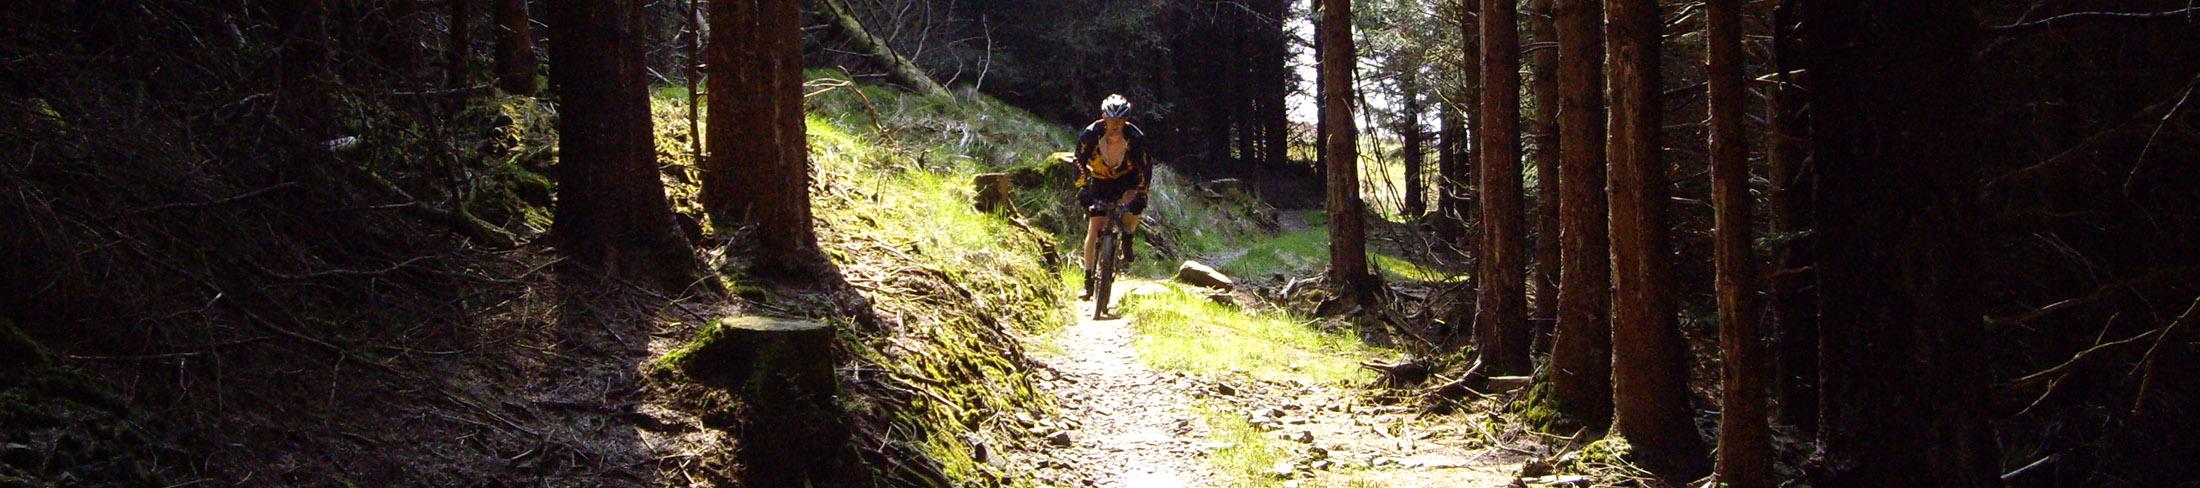 Typical Day Mountain Biking